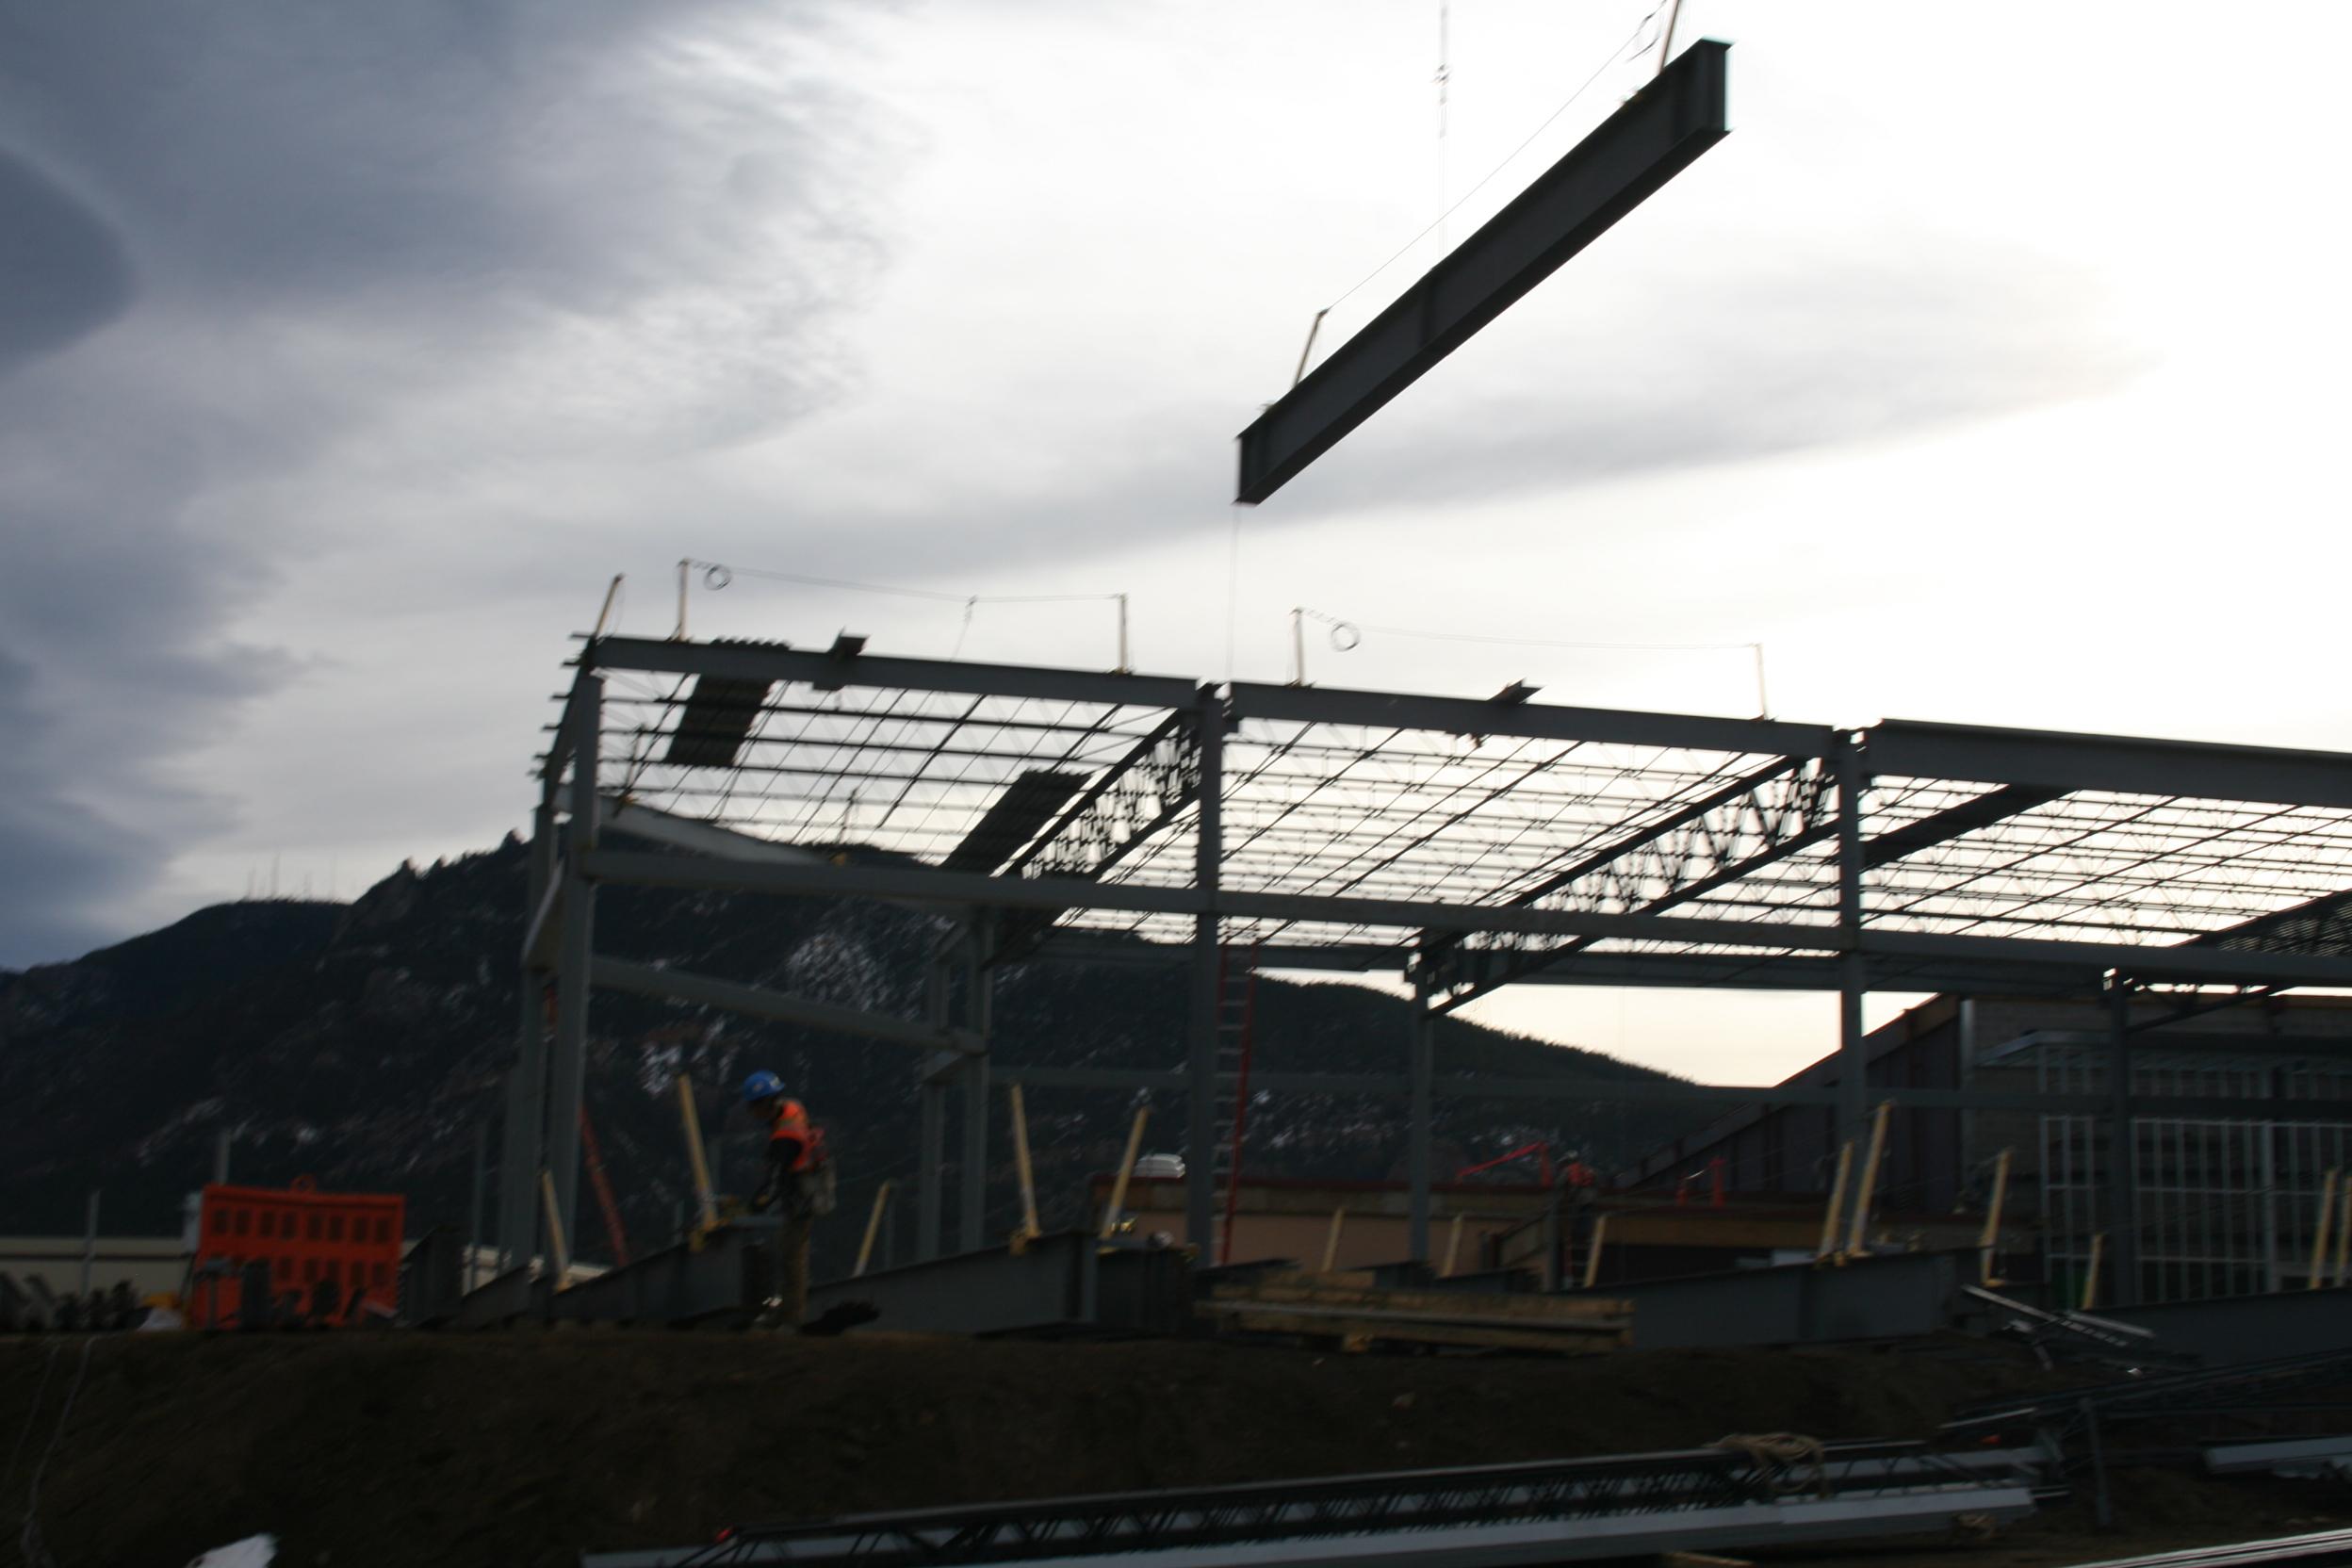 The crane at work.